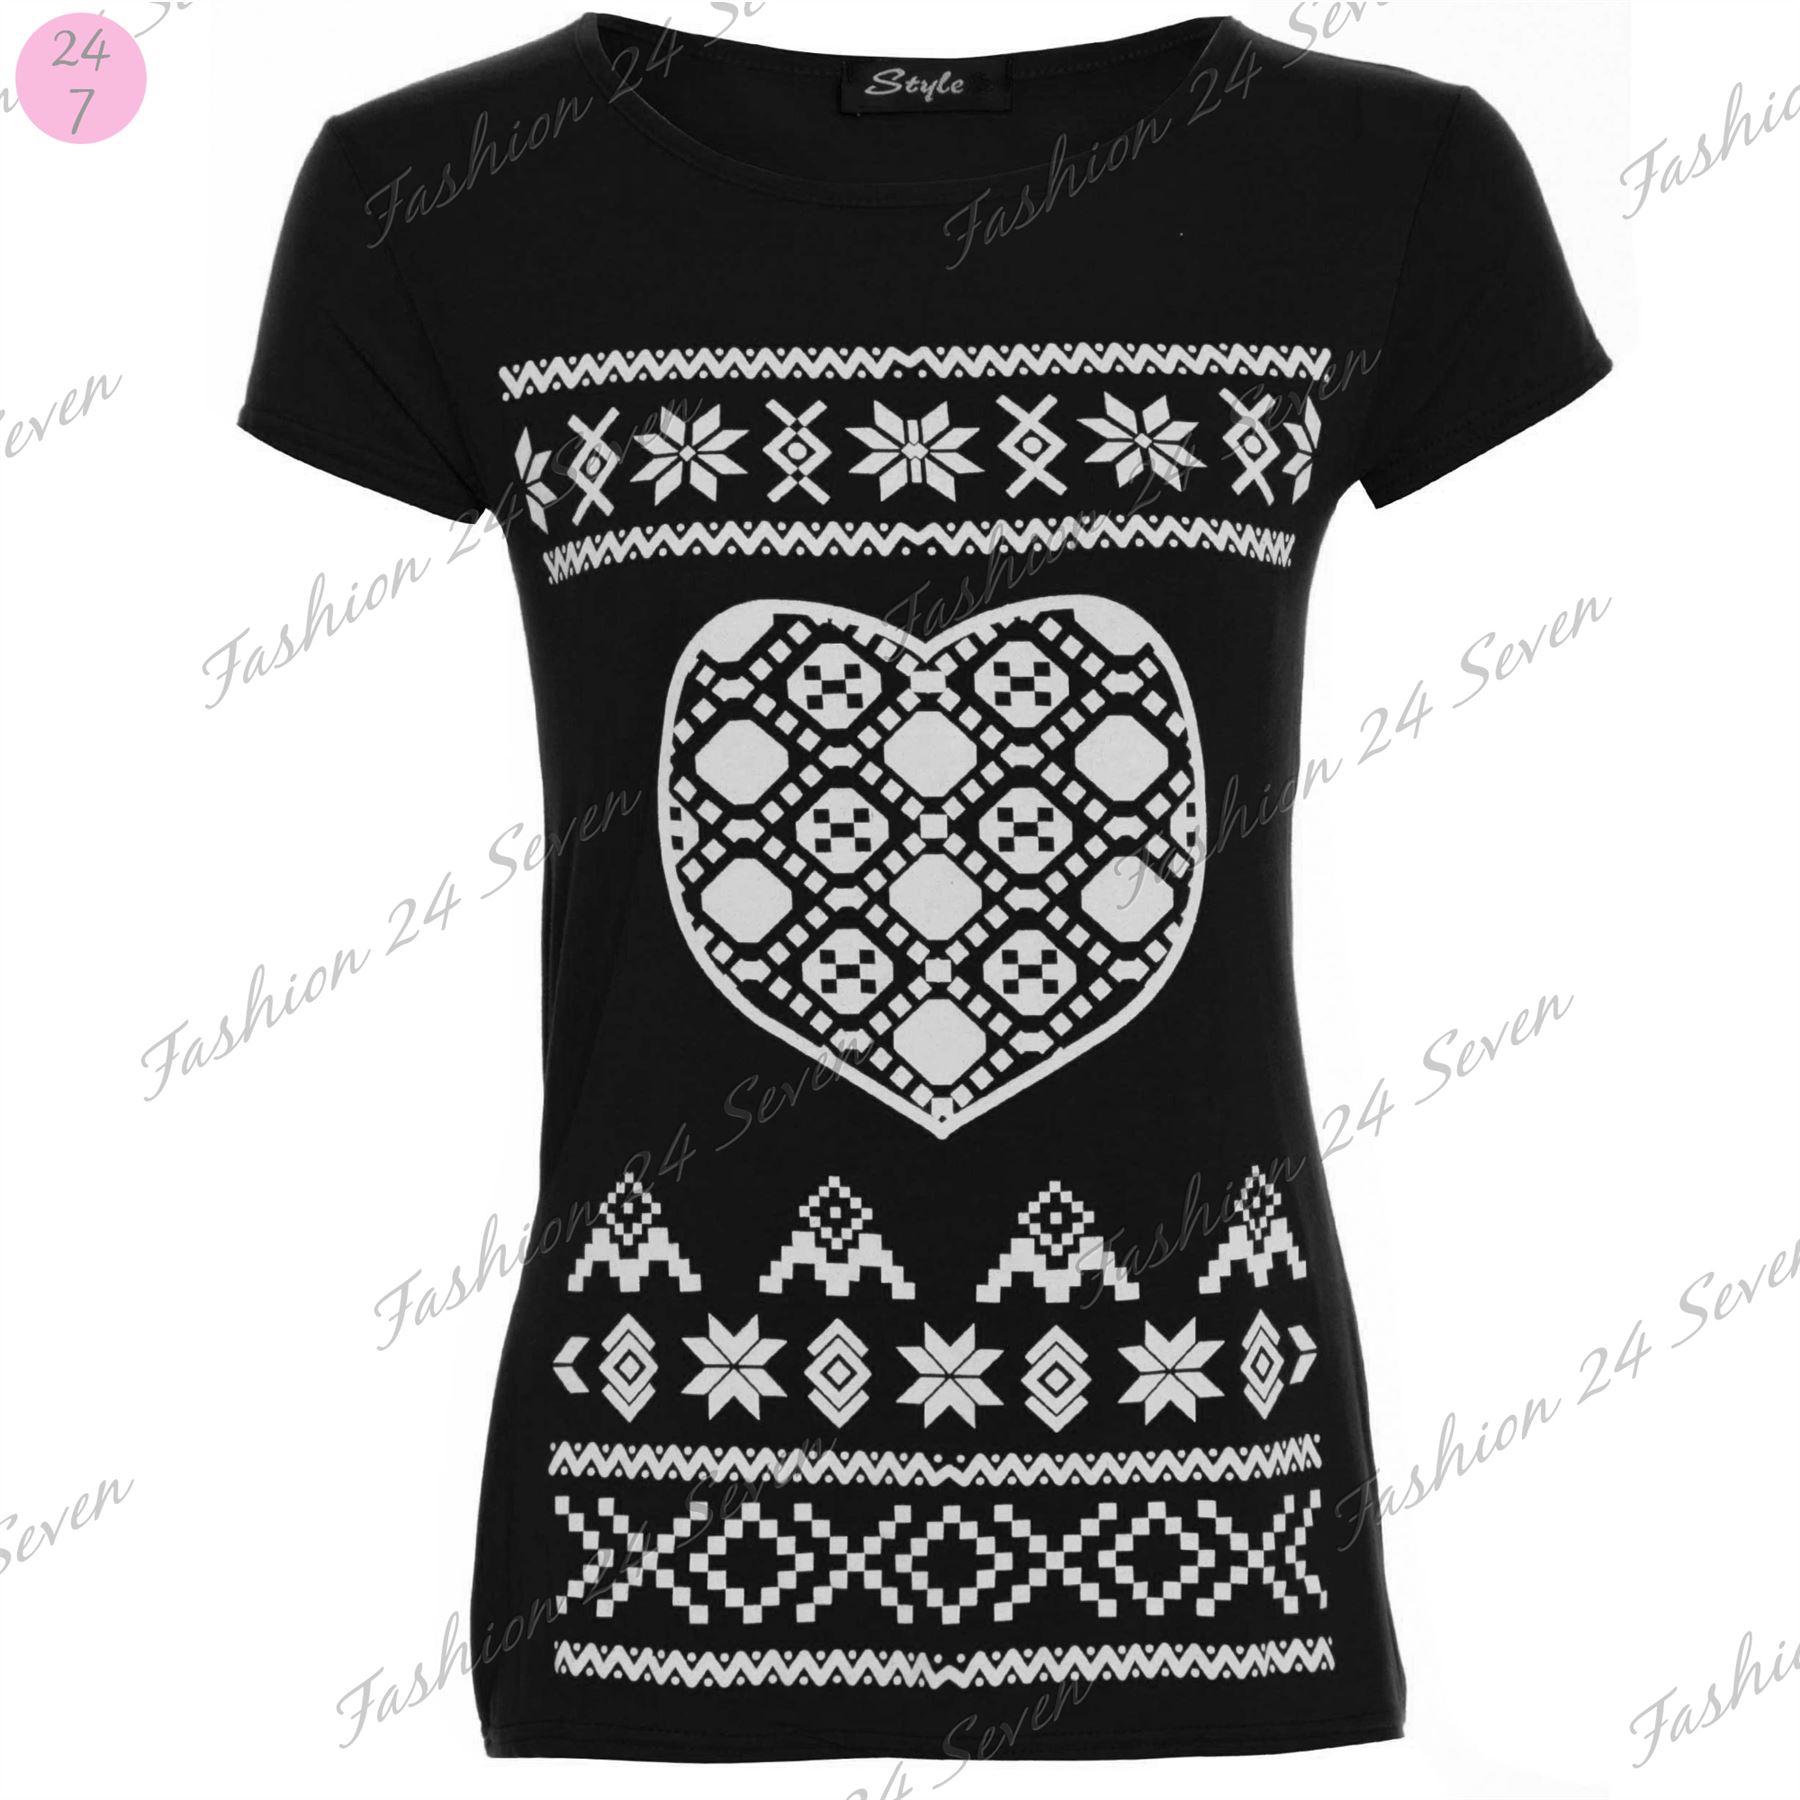 Black xmas t shirt - Womens Ladies Christmas Xmas Santa Snowman Reindeer Batman